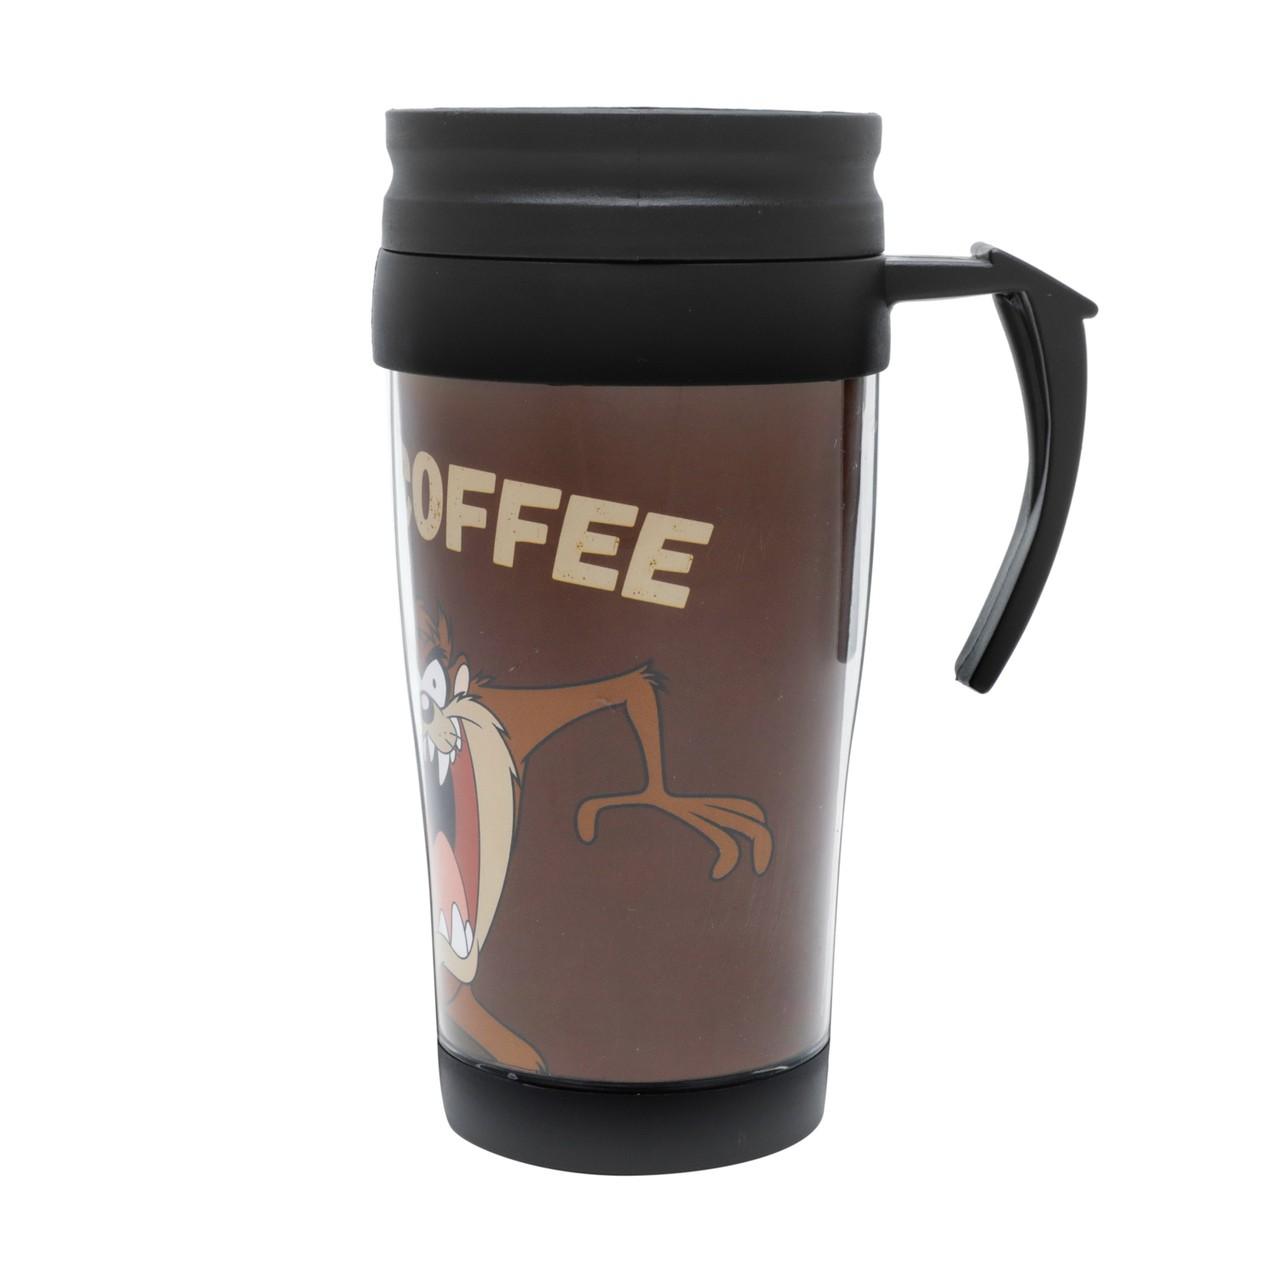 Caneca Térmica: '' Coffee '' Taz Looney Tunes - Urban